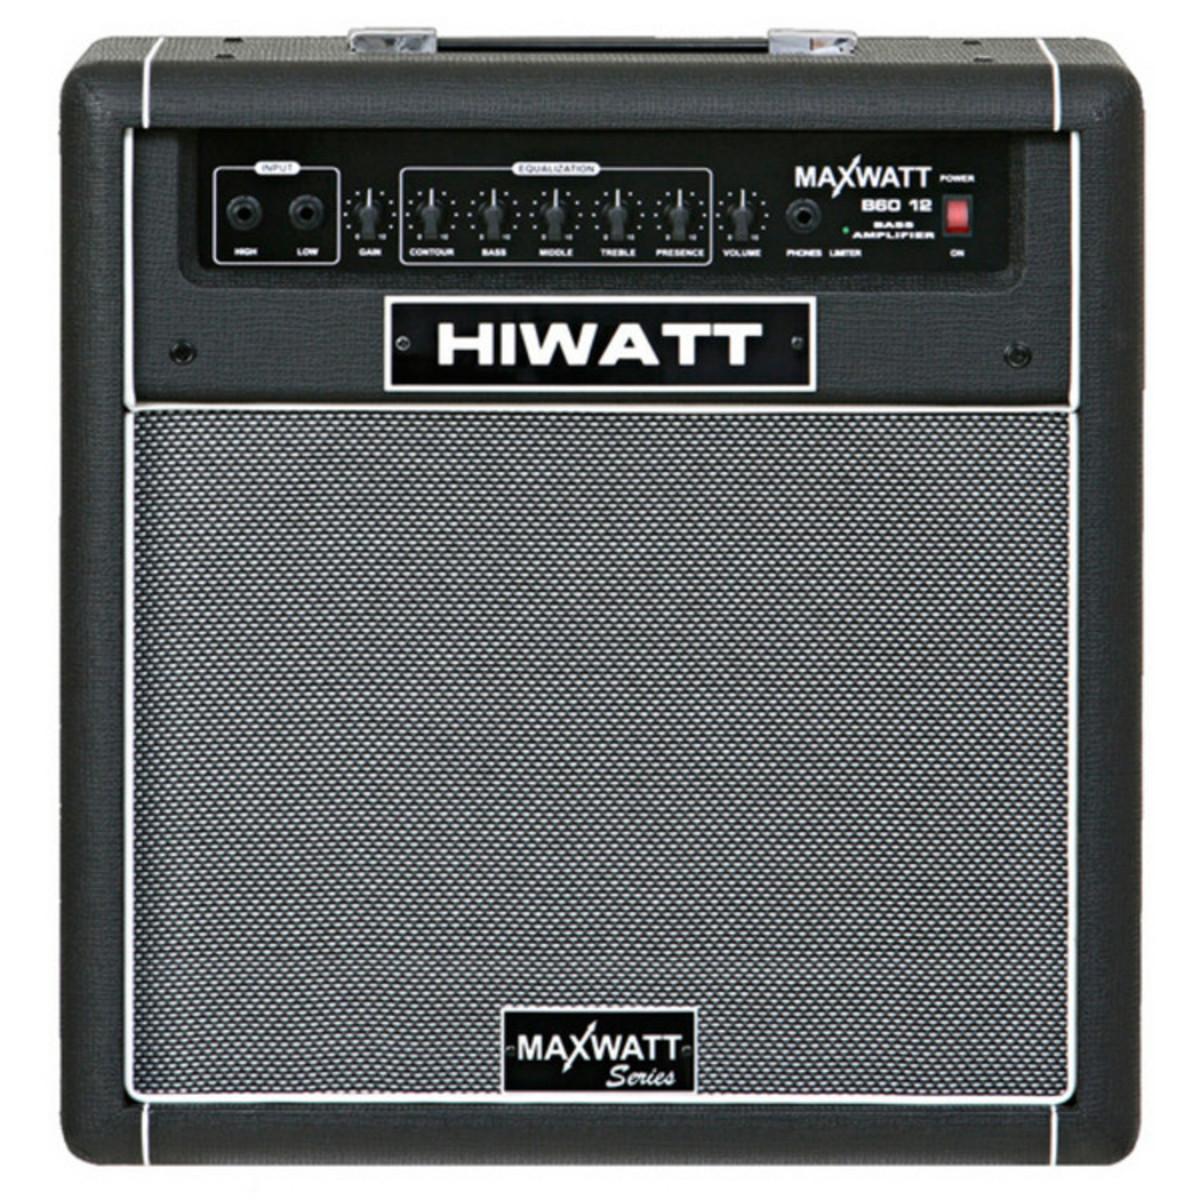 hiwatt maxwatt series 60w bass amp black at gear4music. Black Bedroom Furniture Sets. Home Design Ideas